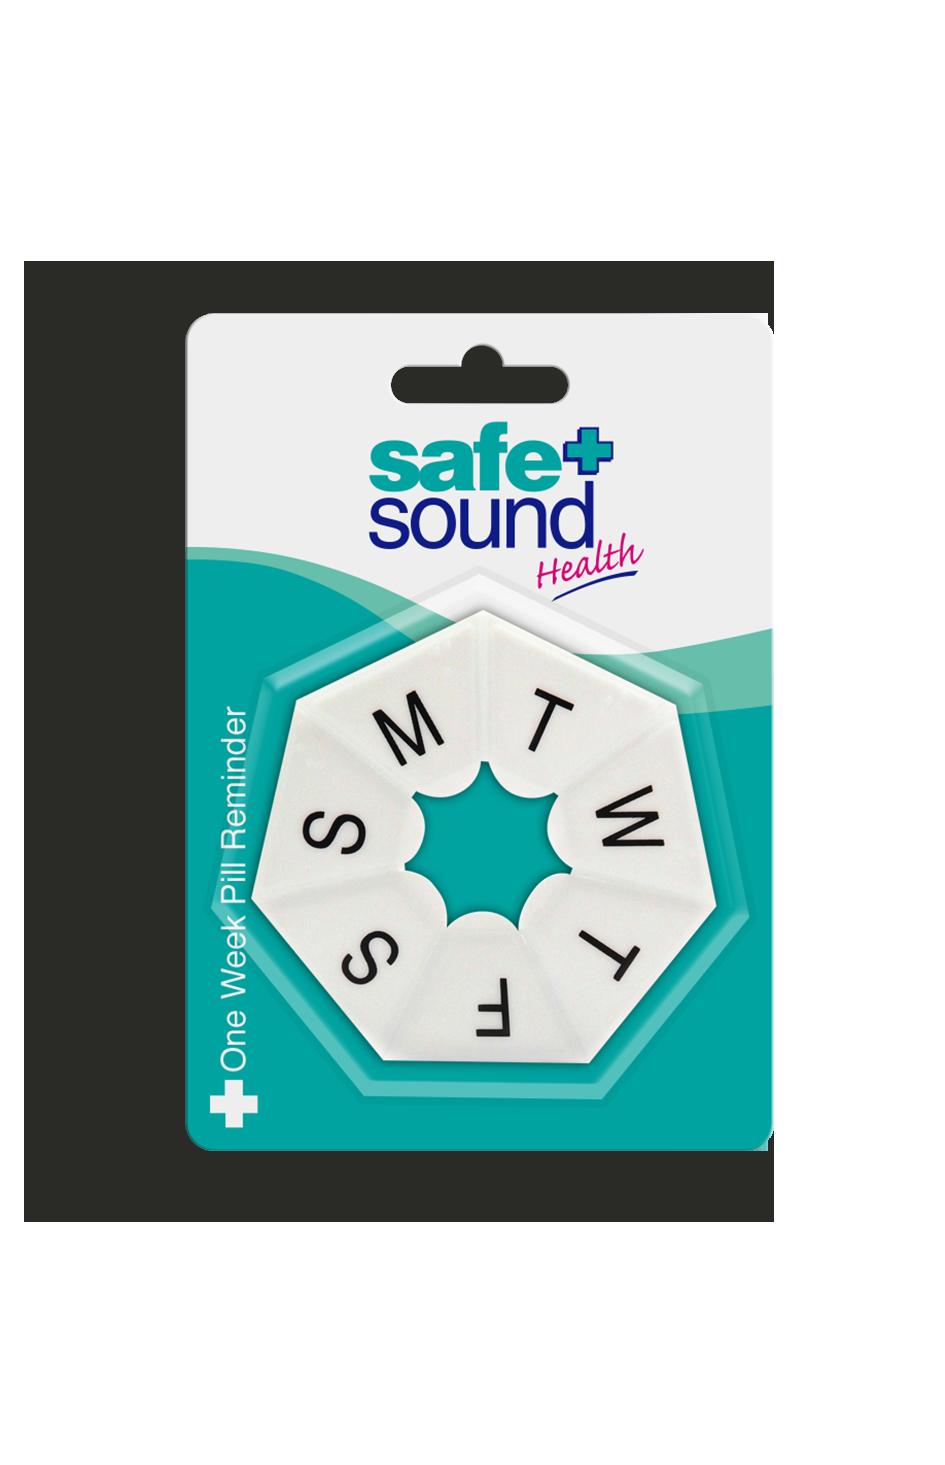 Safe and Sound Health Round Pocket Size 7 Day Pillbox